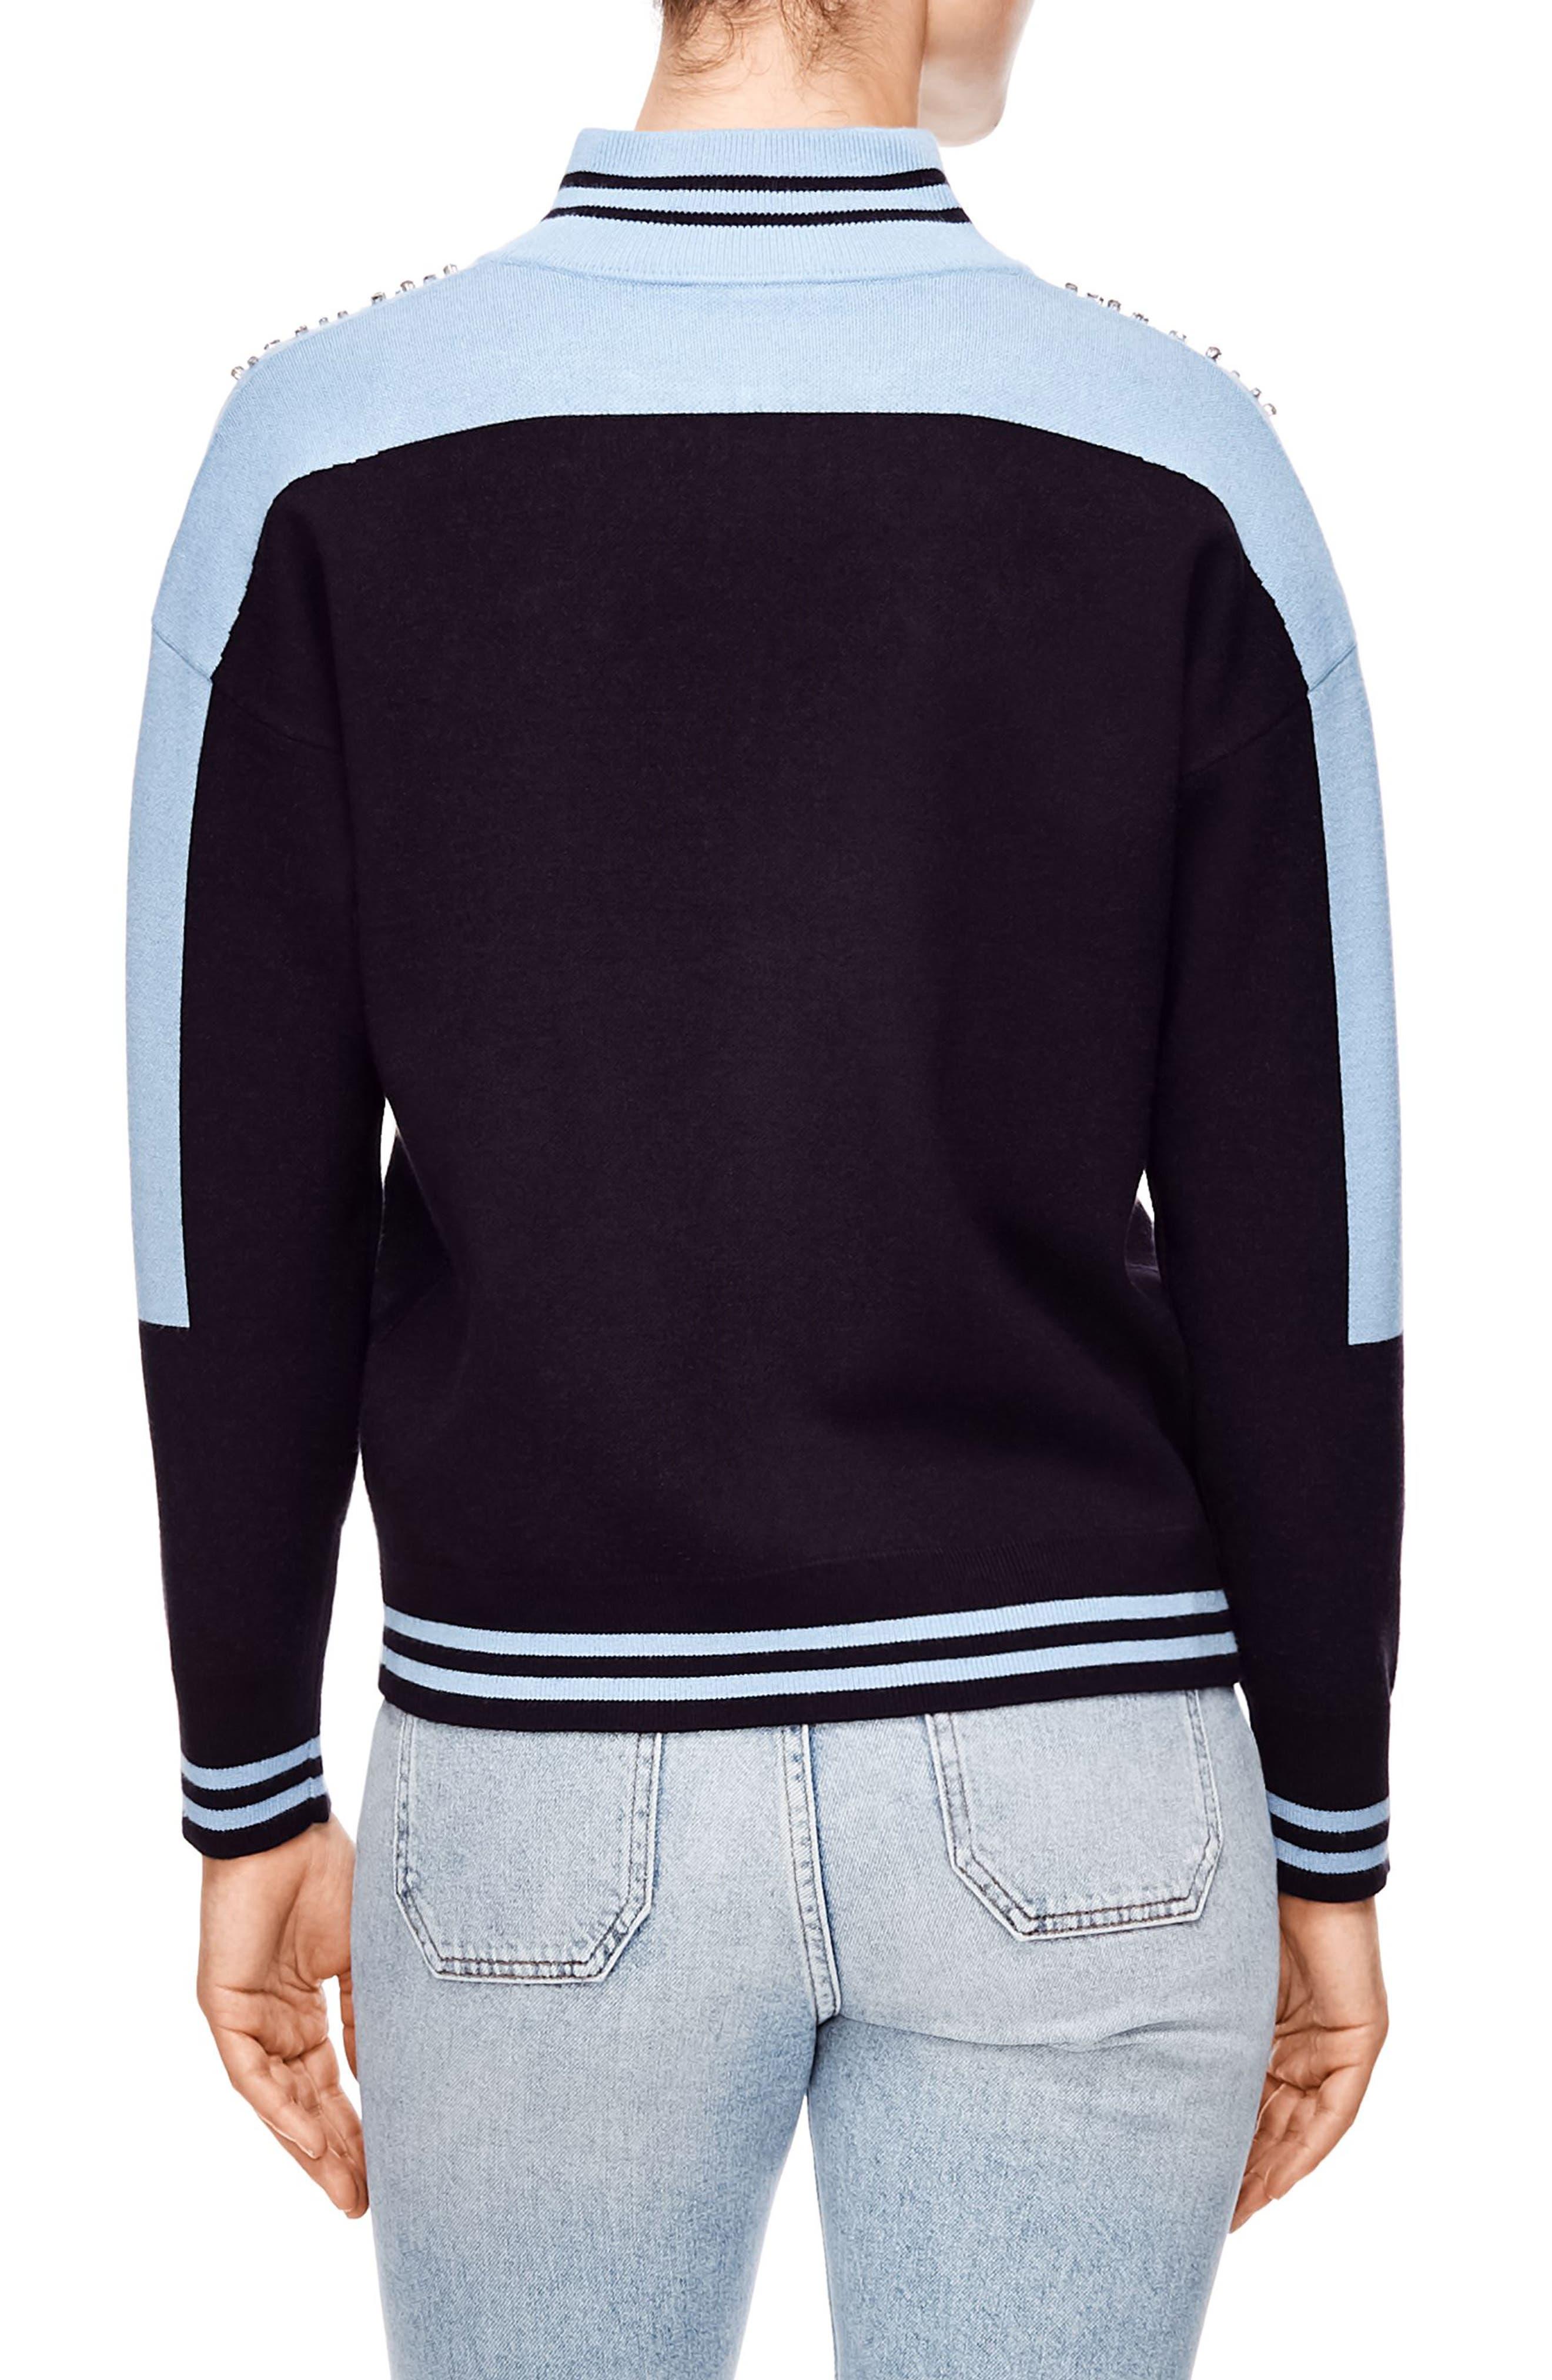 Embellished Sweater Jacket,                             Alternate thumbnail 2, color,                             452